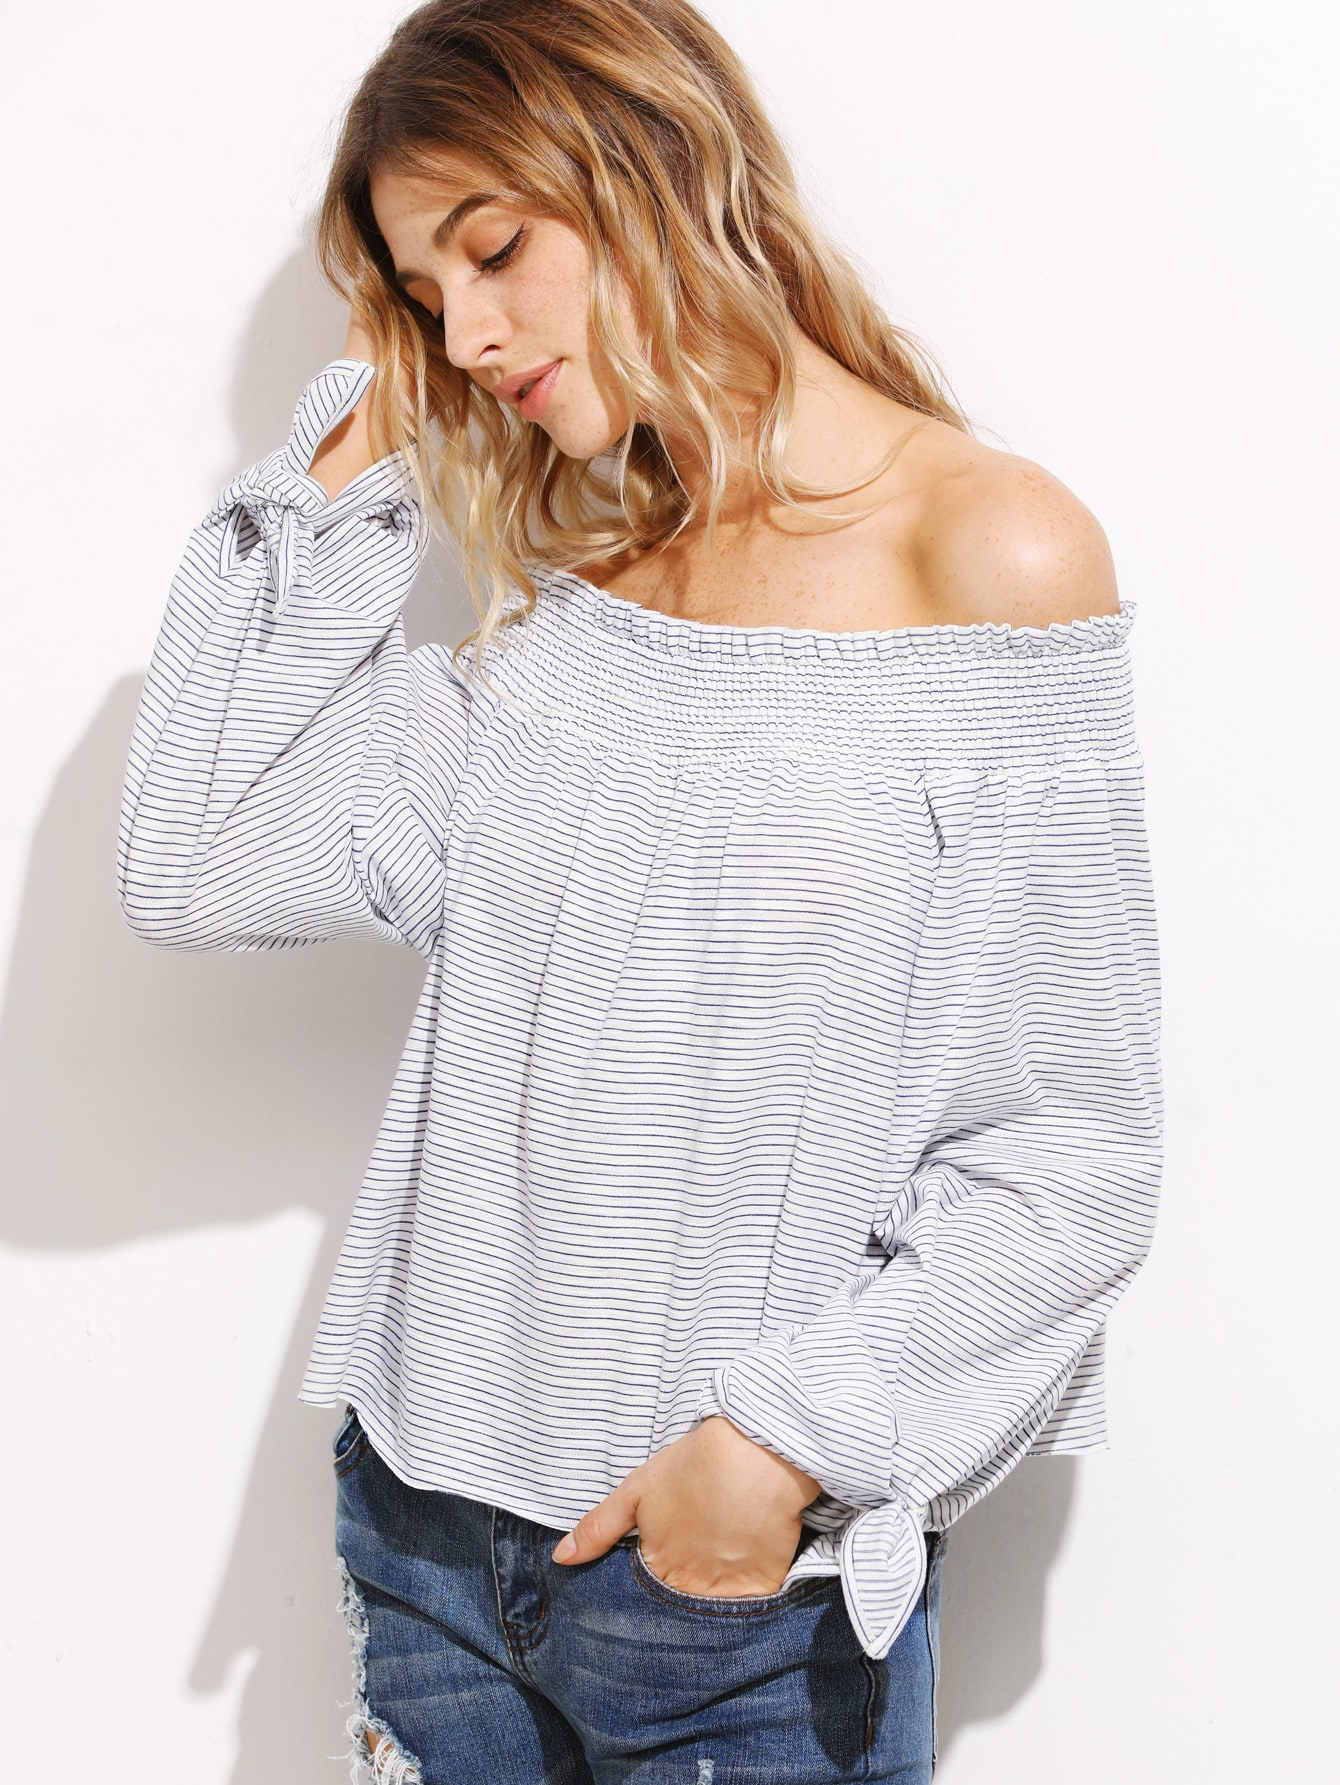 blouse161011702_2